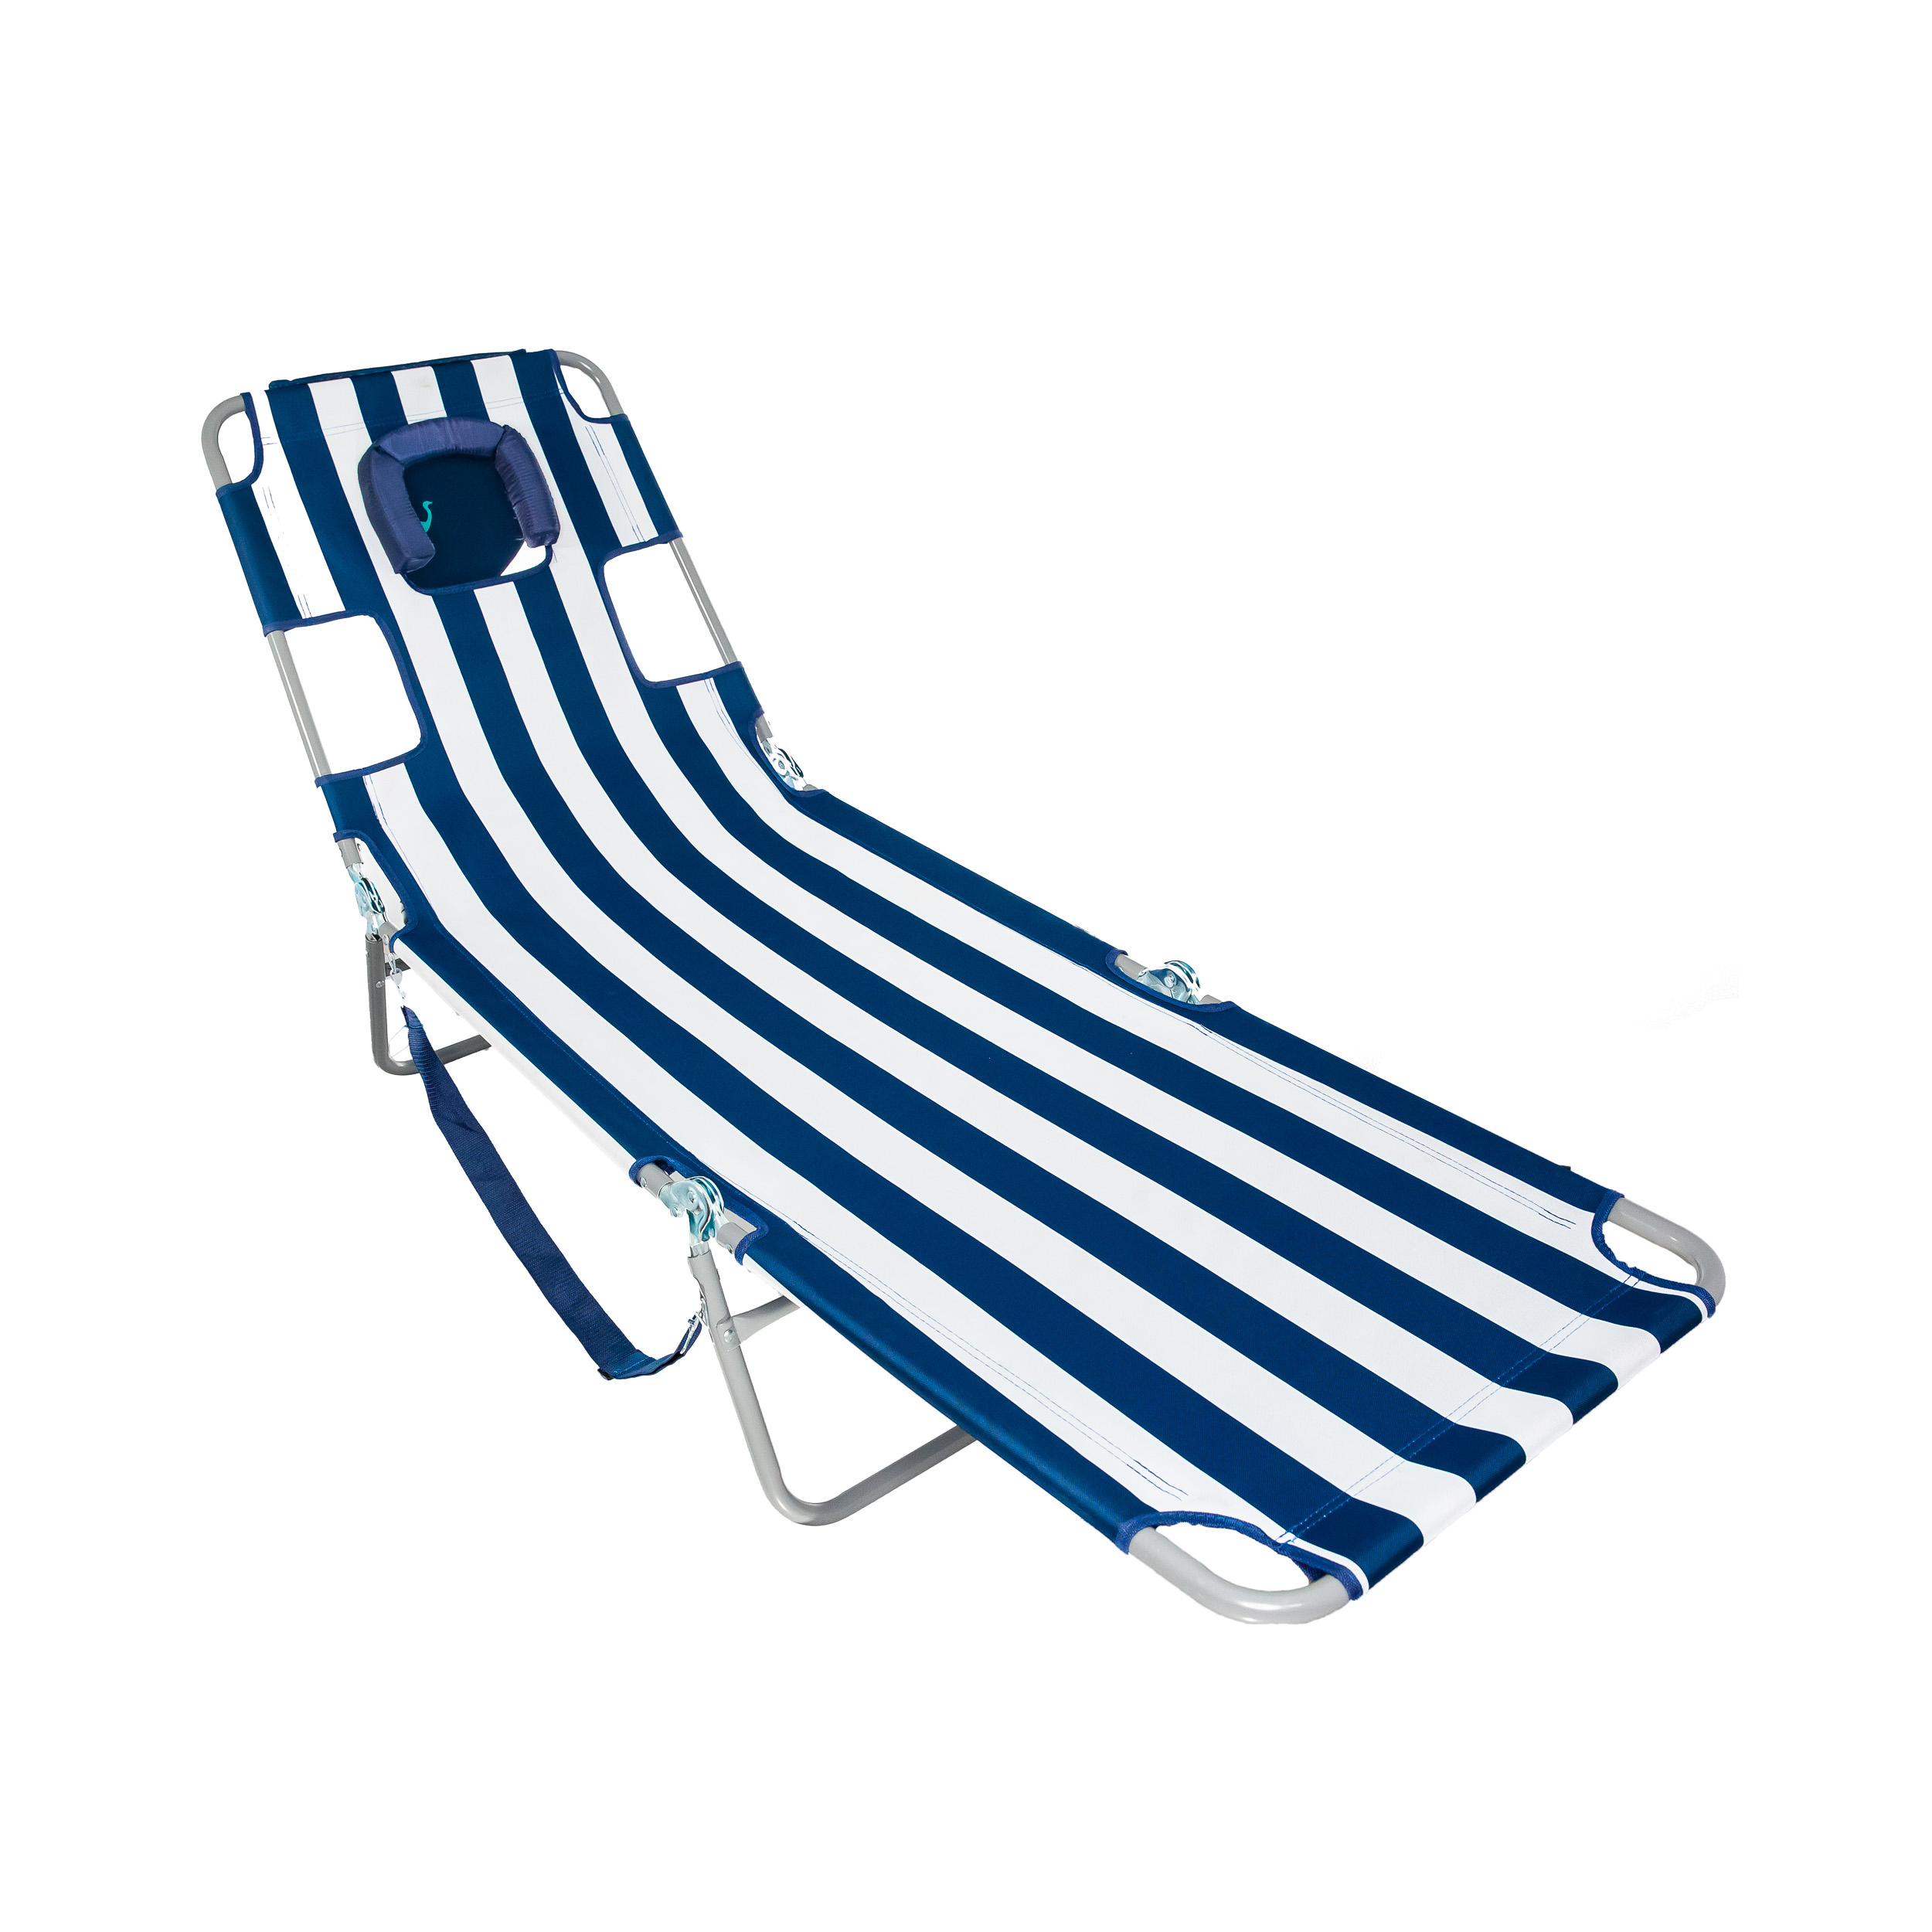 Strange Details About Ostrich Chaise Lounge Folding Portable Sunbathing Beach Chair Navy Stripes Dailytribune Chair Design For Home Dailytribuneorg